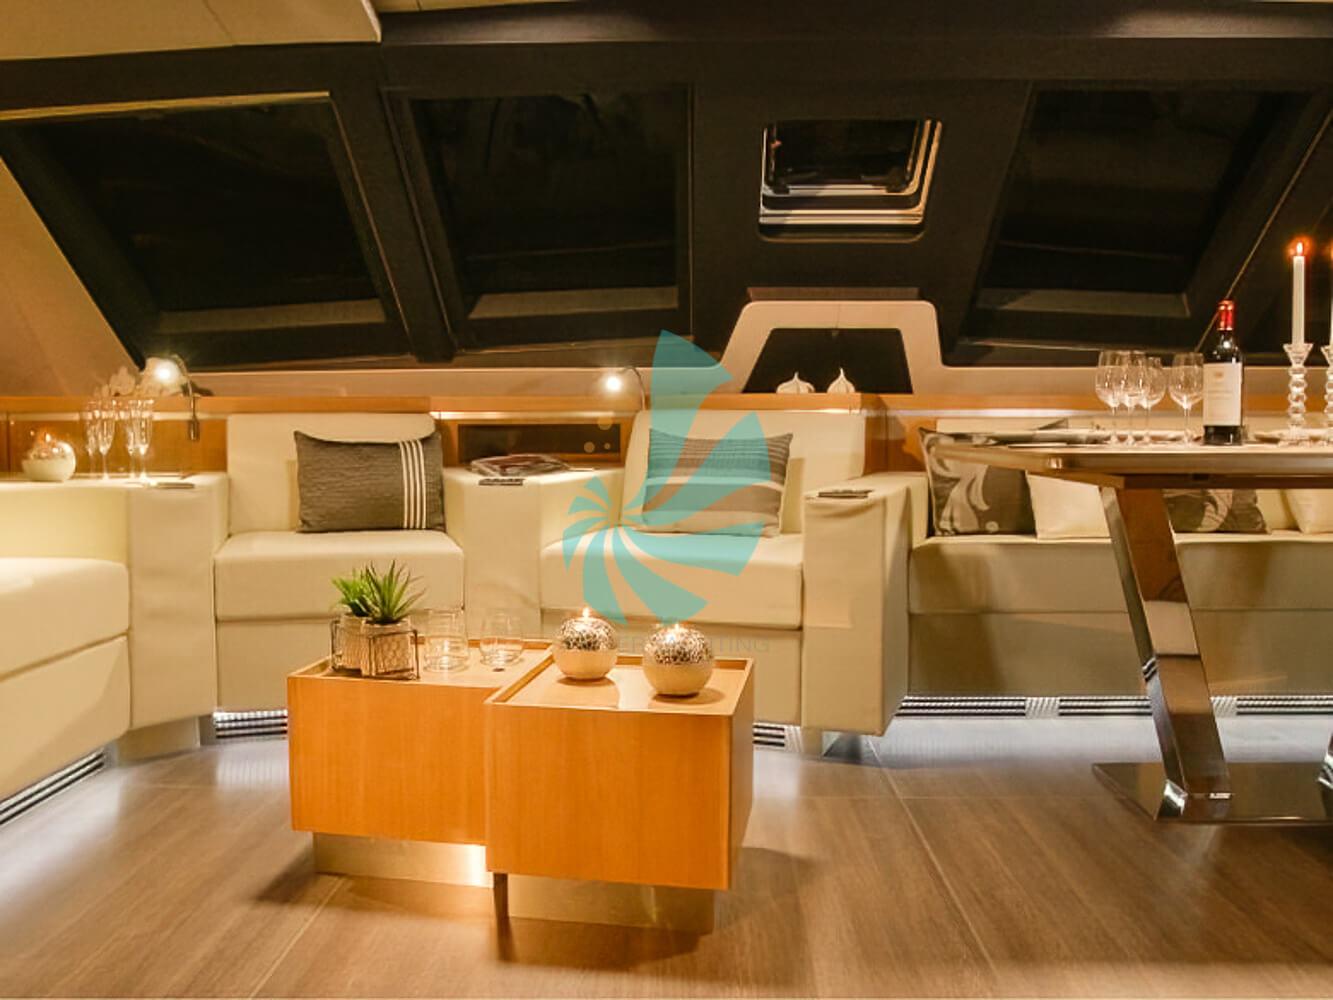 Sailing CAtamaran Privilege Serie 6 interior, for sale at www.amber-yachting.com